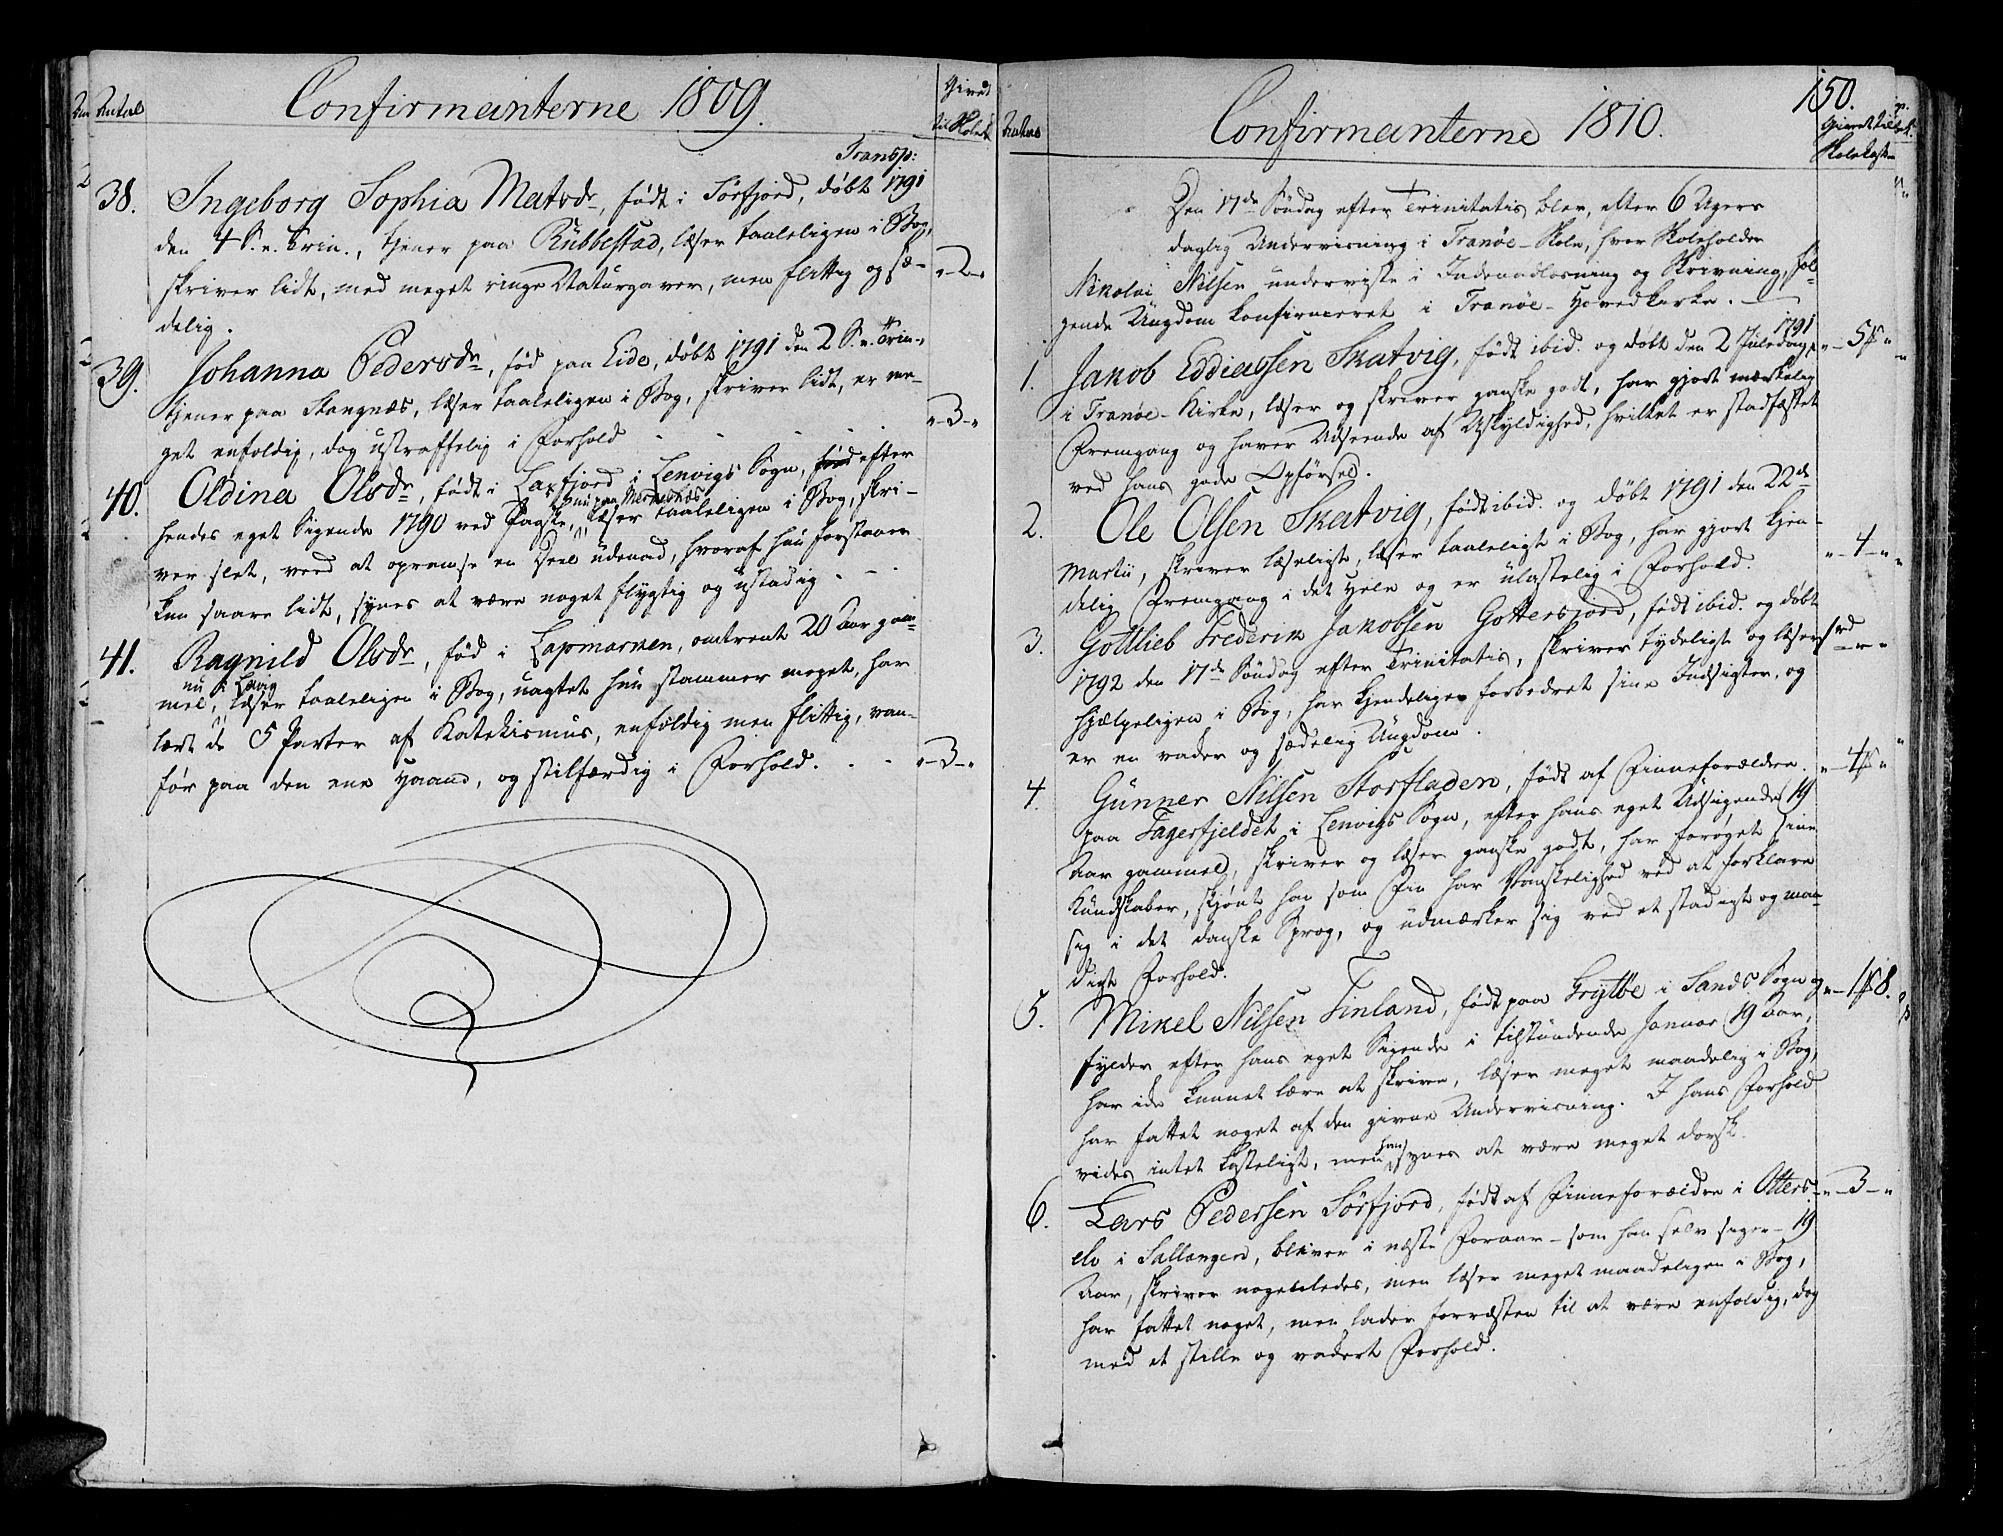 SATØ, Tranøy sokneprestkontor, I/Ia/Iaa/L0003kirke: Ministerialbok nr. 3, 1807-1820, s. 150